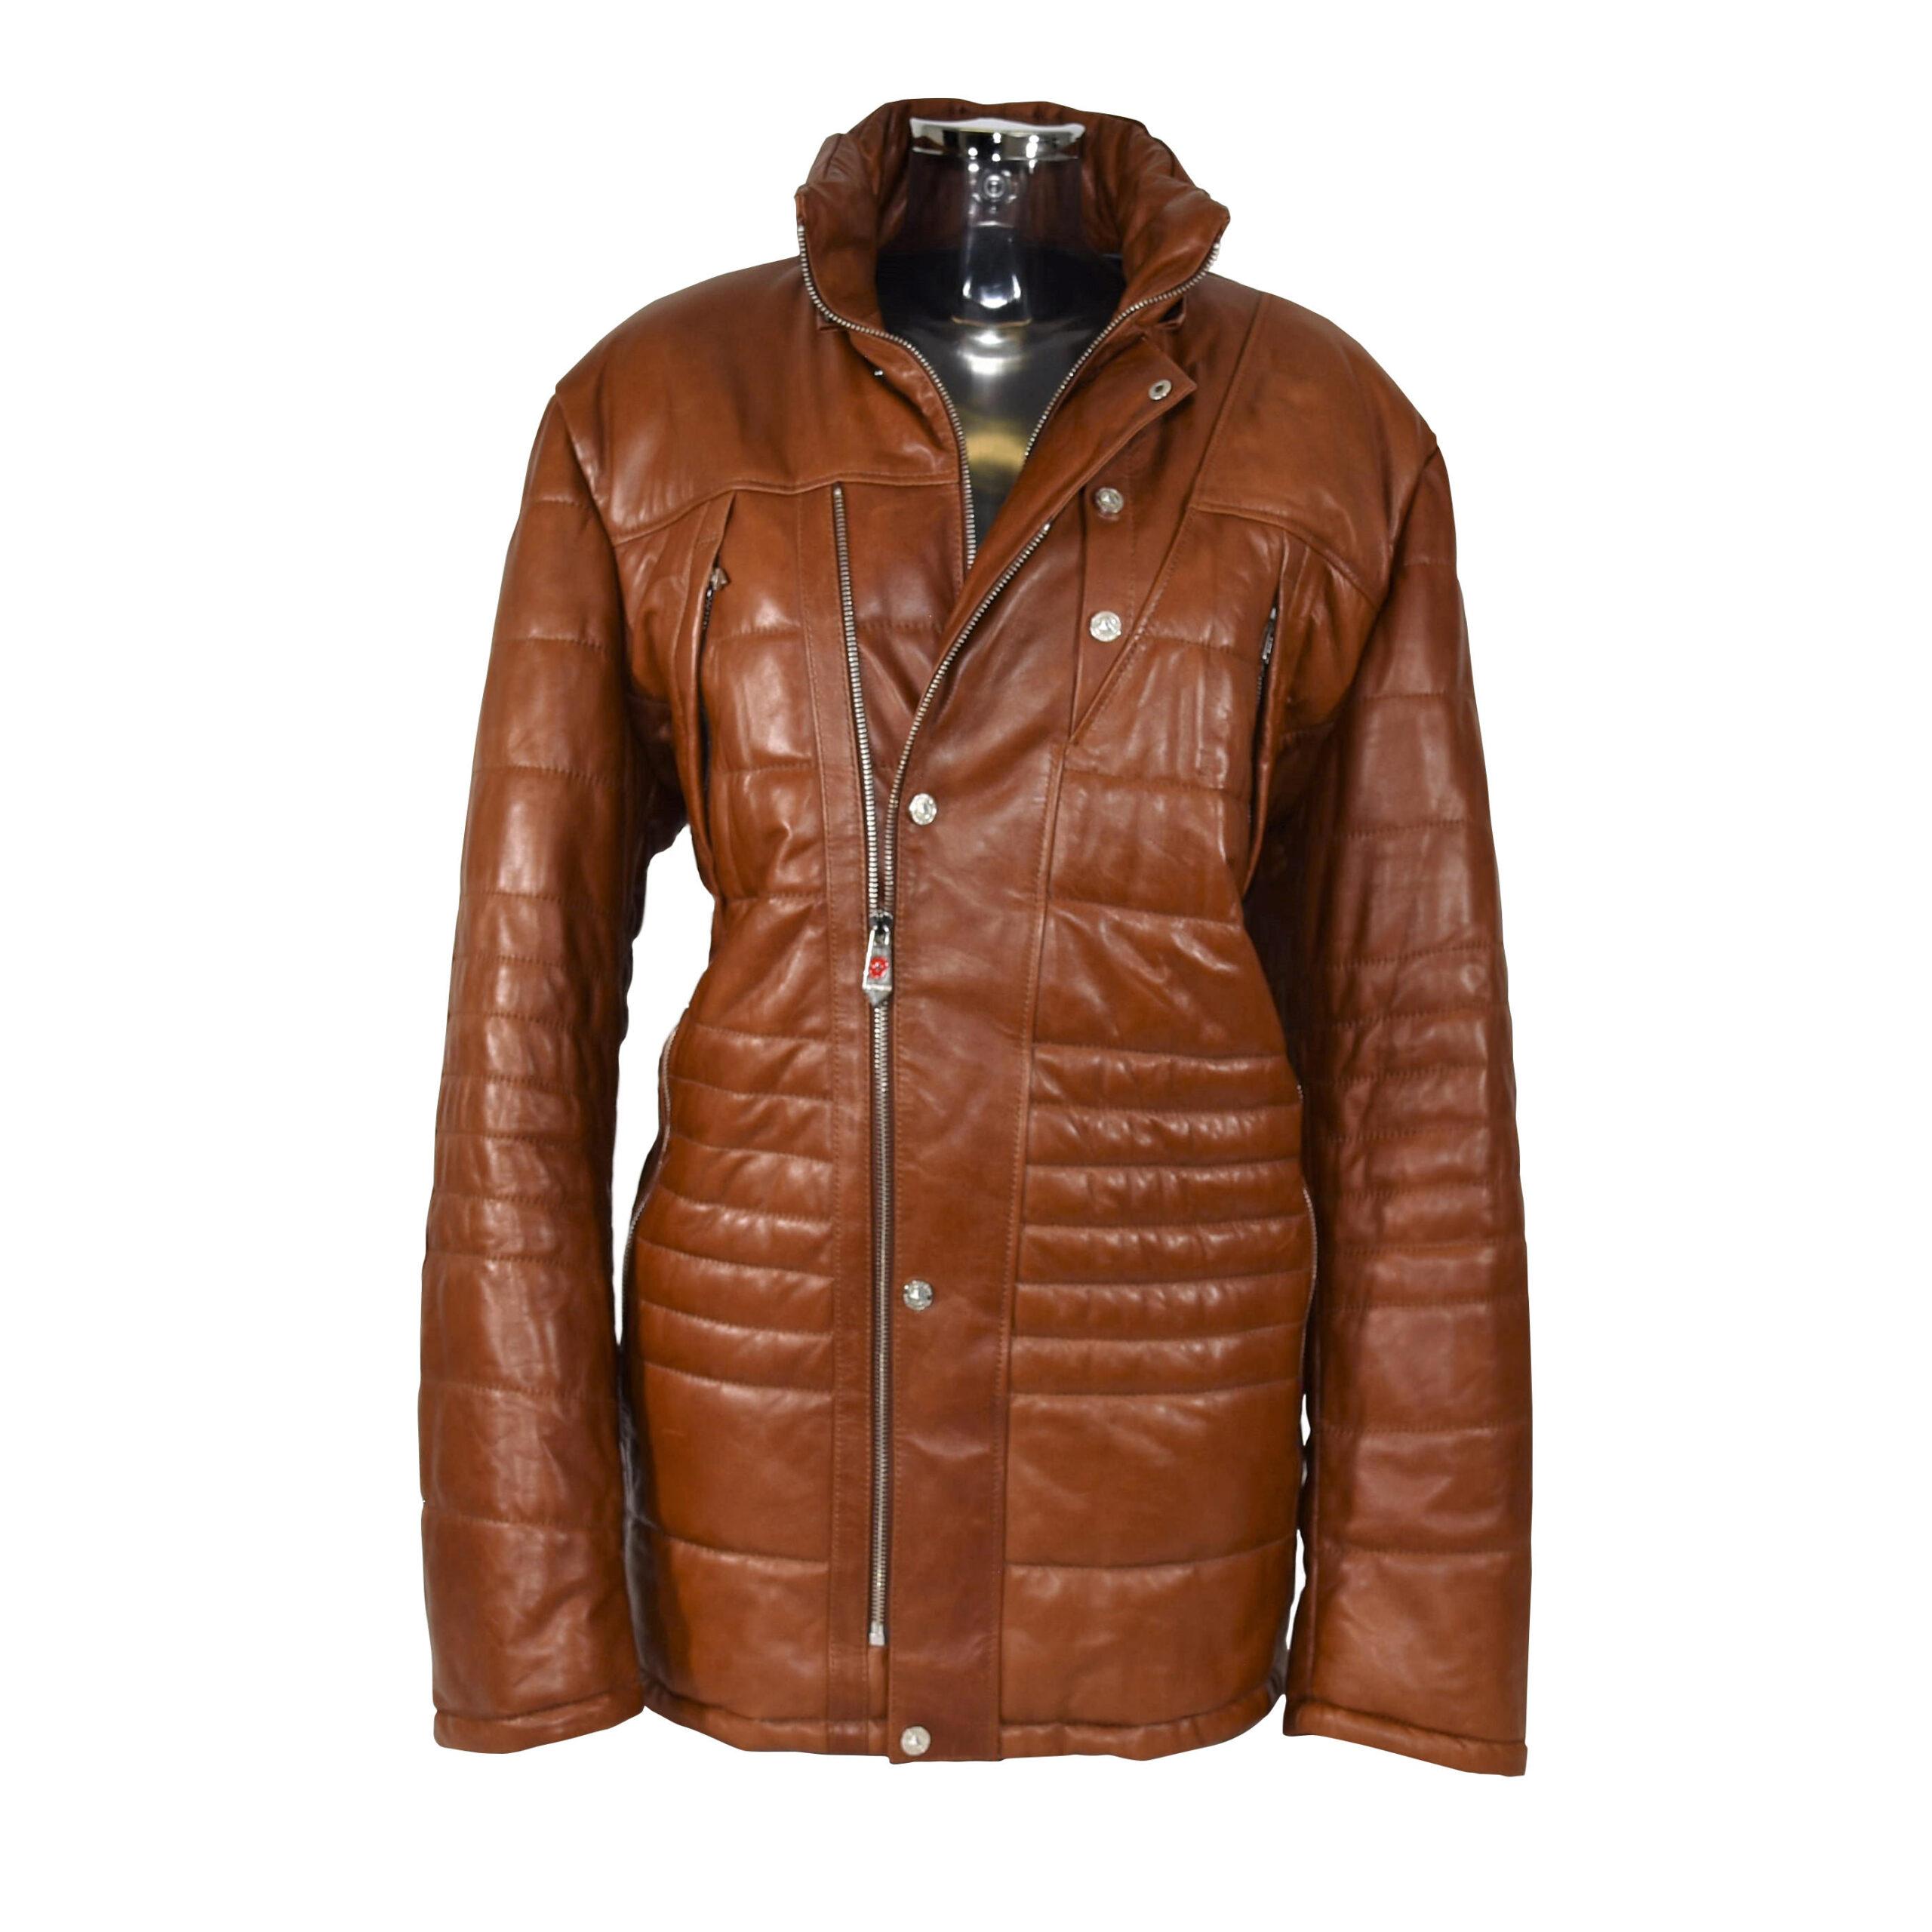 Jacket ANNIKA ANNIKA Lederjacke Damen Swiss Swiss Jacket 0wvmnN8O